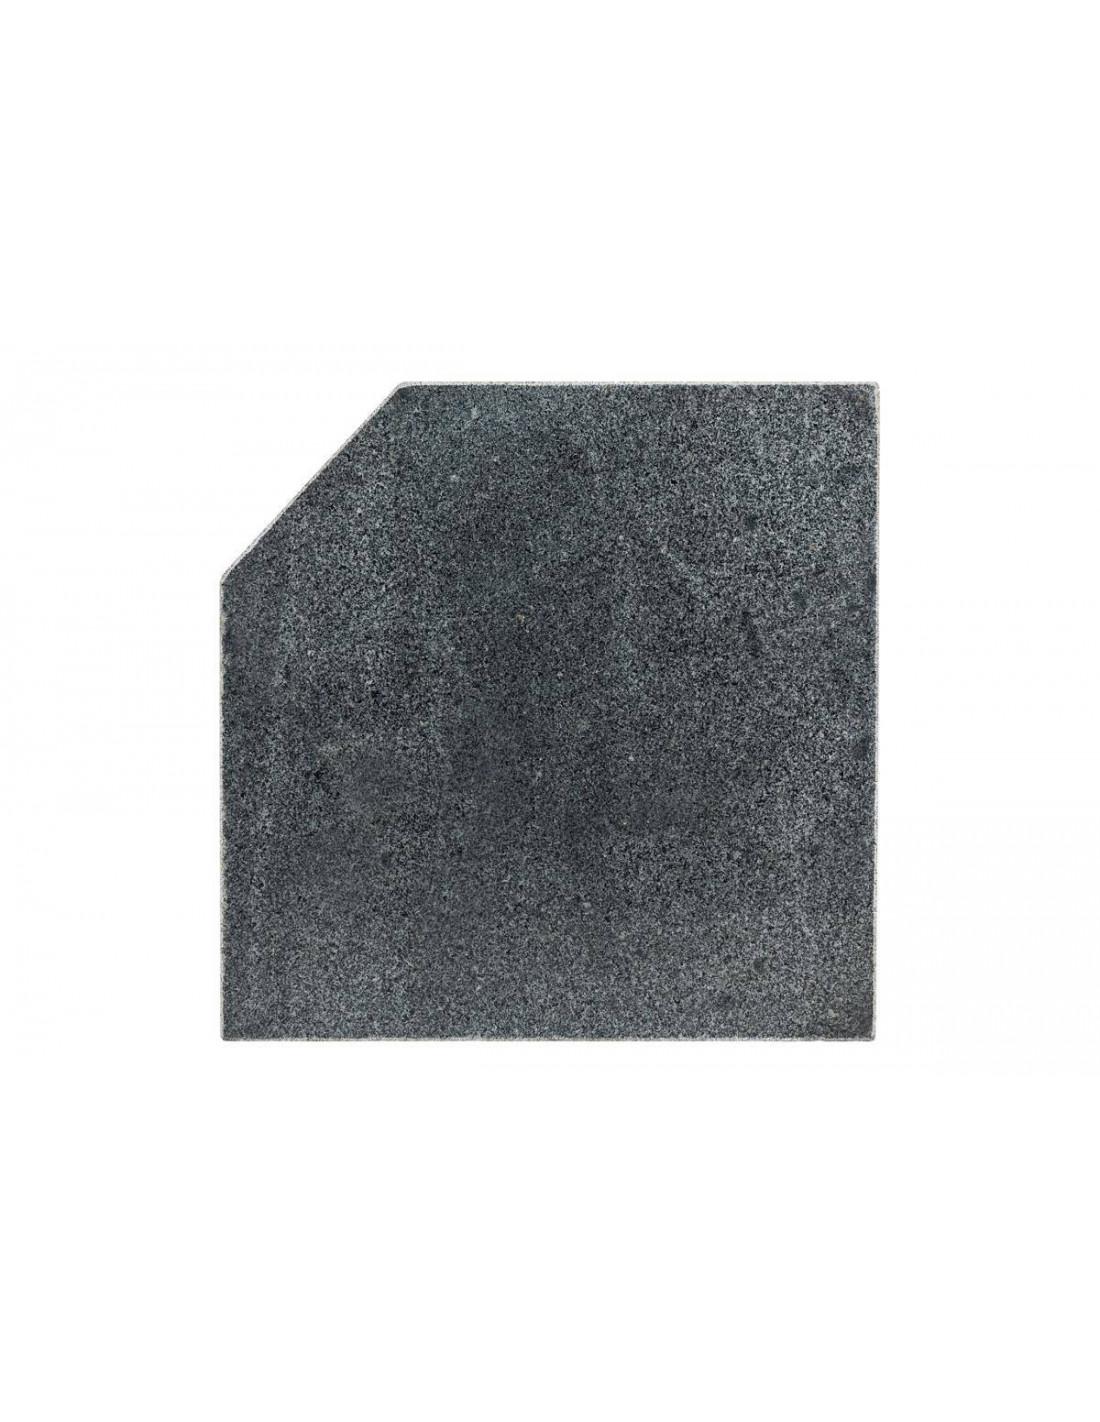 dalle pour parasol d port 28 5 kg marbre hesp ride. Black Bedroom Furniture Sets. Home Design Ideas